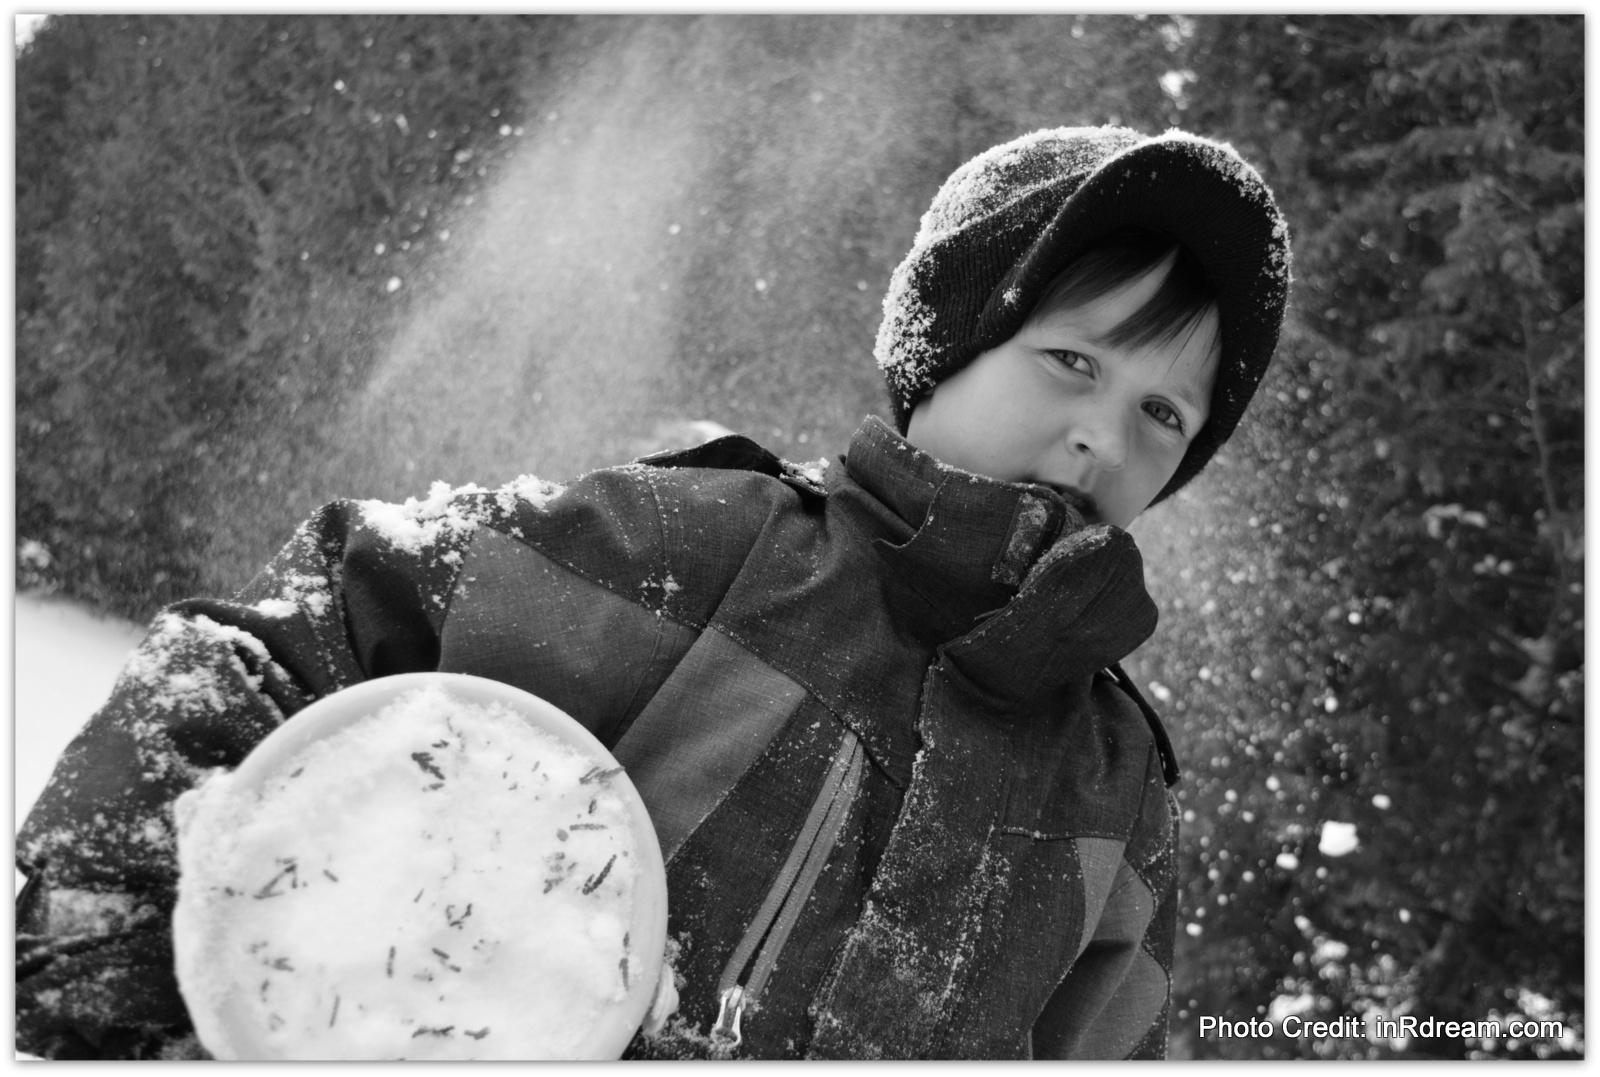 Winter Activity Ideas to #MakeRoomForPlay + Mama's Tips to Enjoy it!